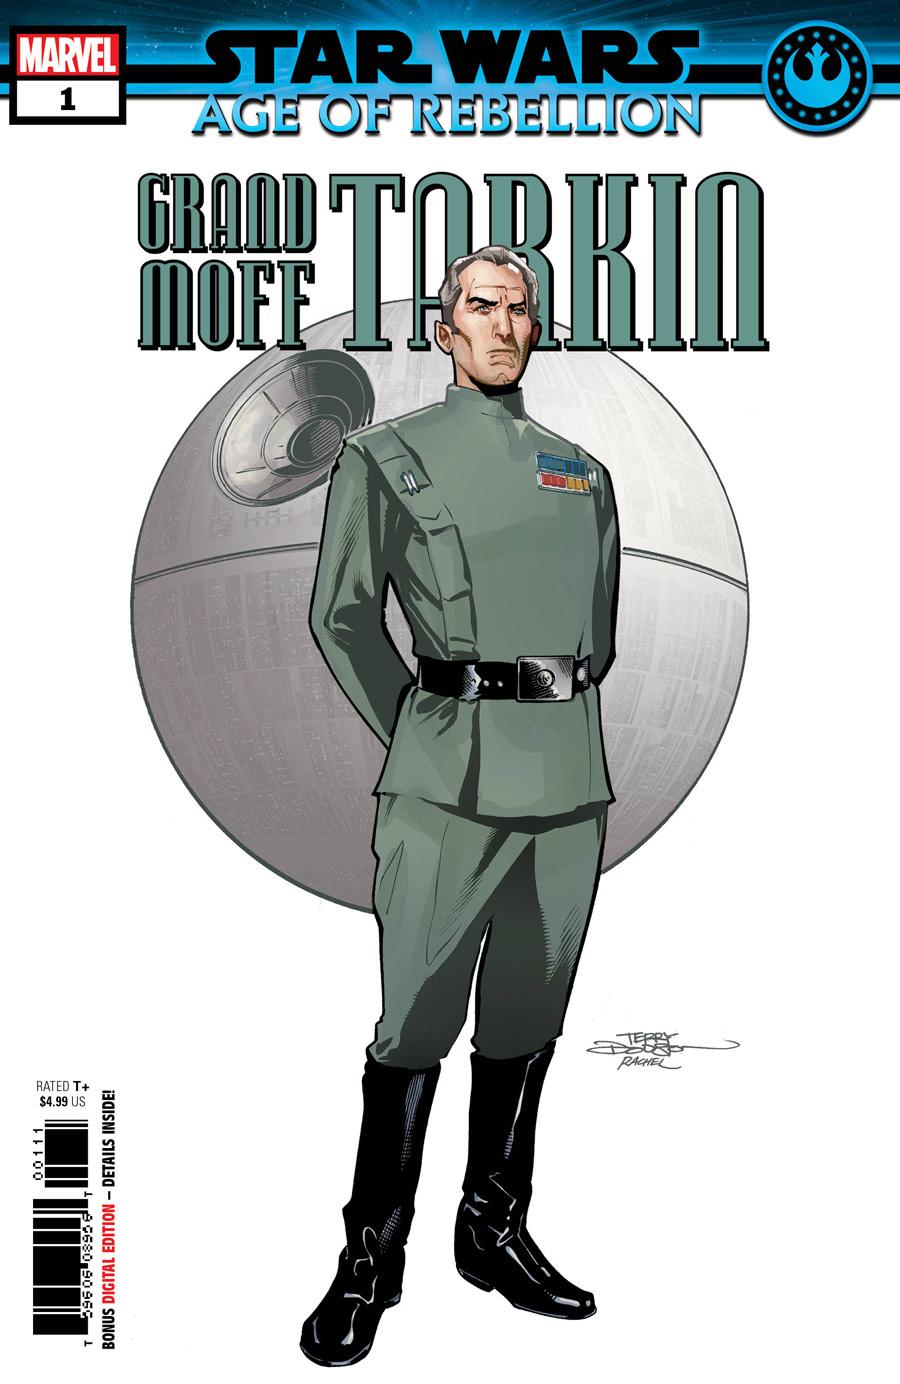 Star Wars: Age of Rebellion - Tarkin #1, copertina di Terry Dodson